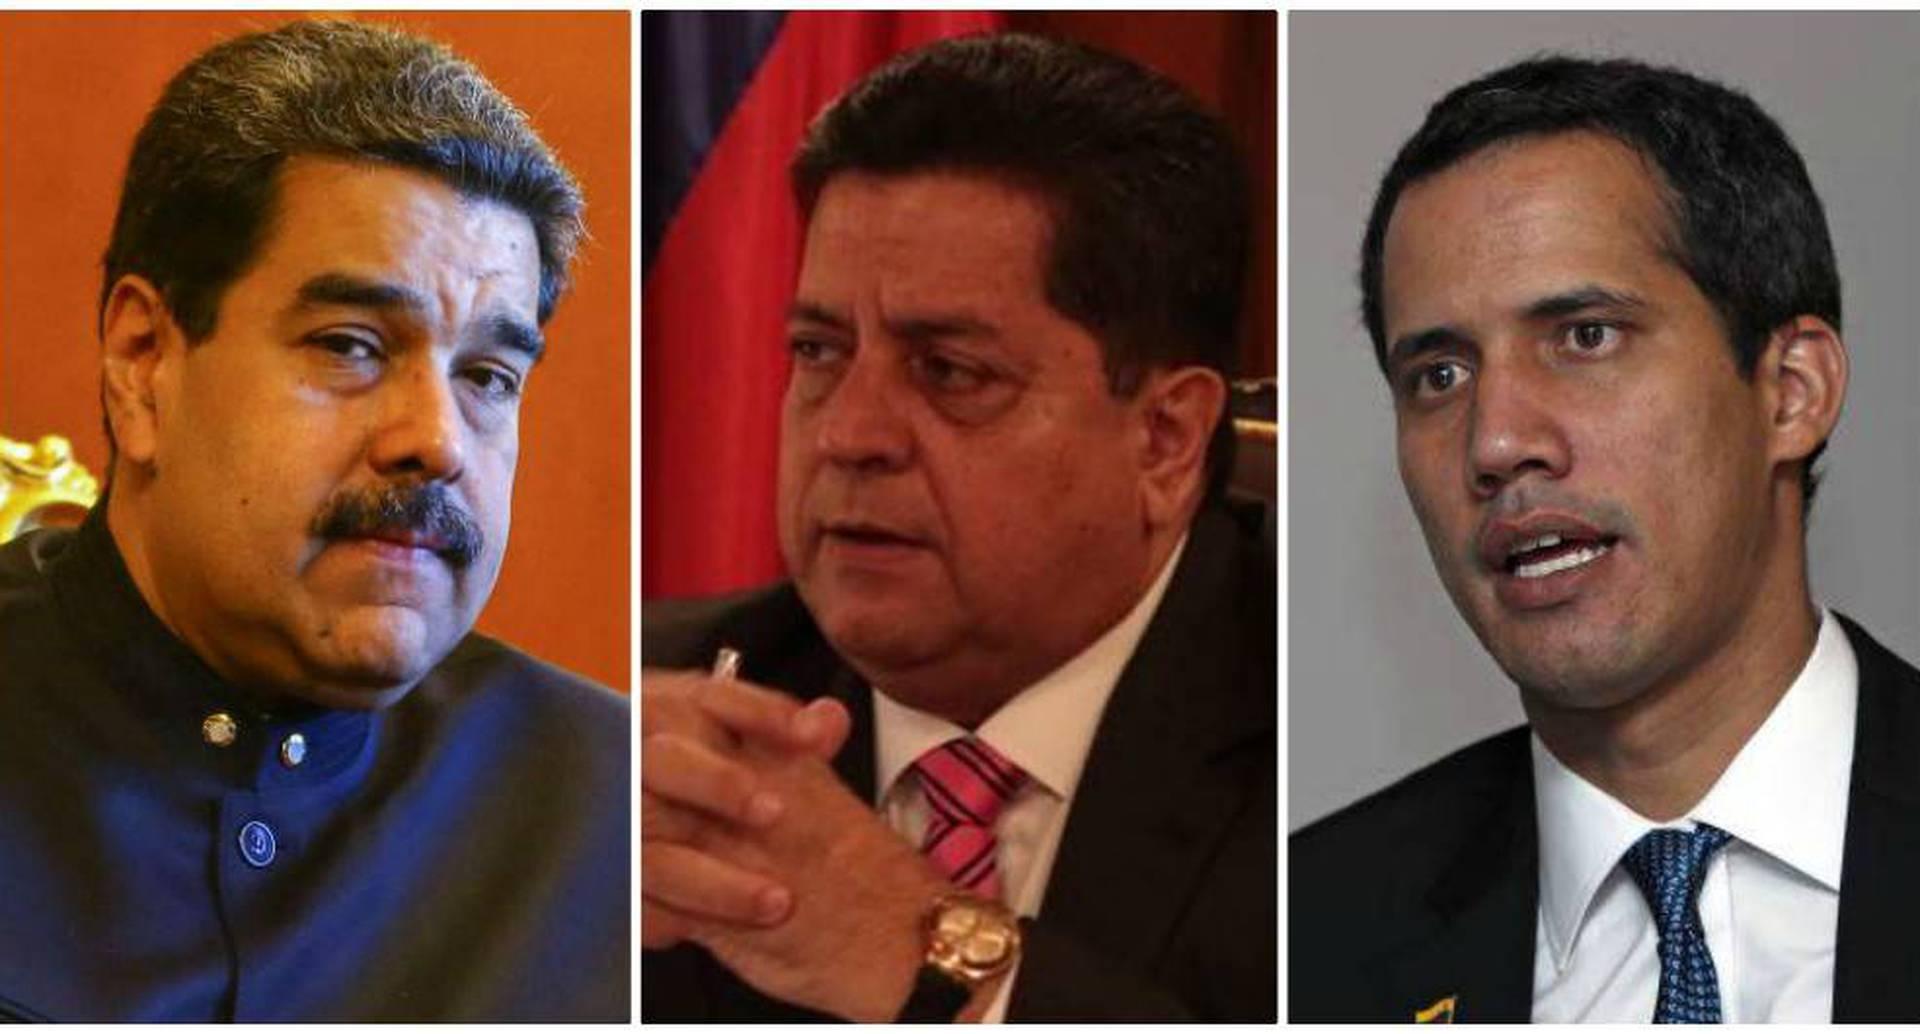 La ofensiva judicial generó una firme condena de países que respaldan a Guaidó.